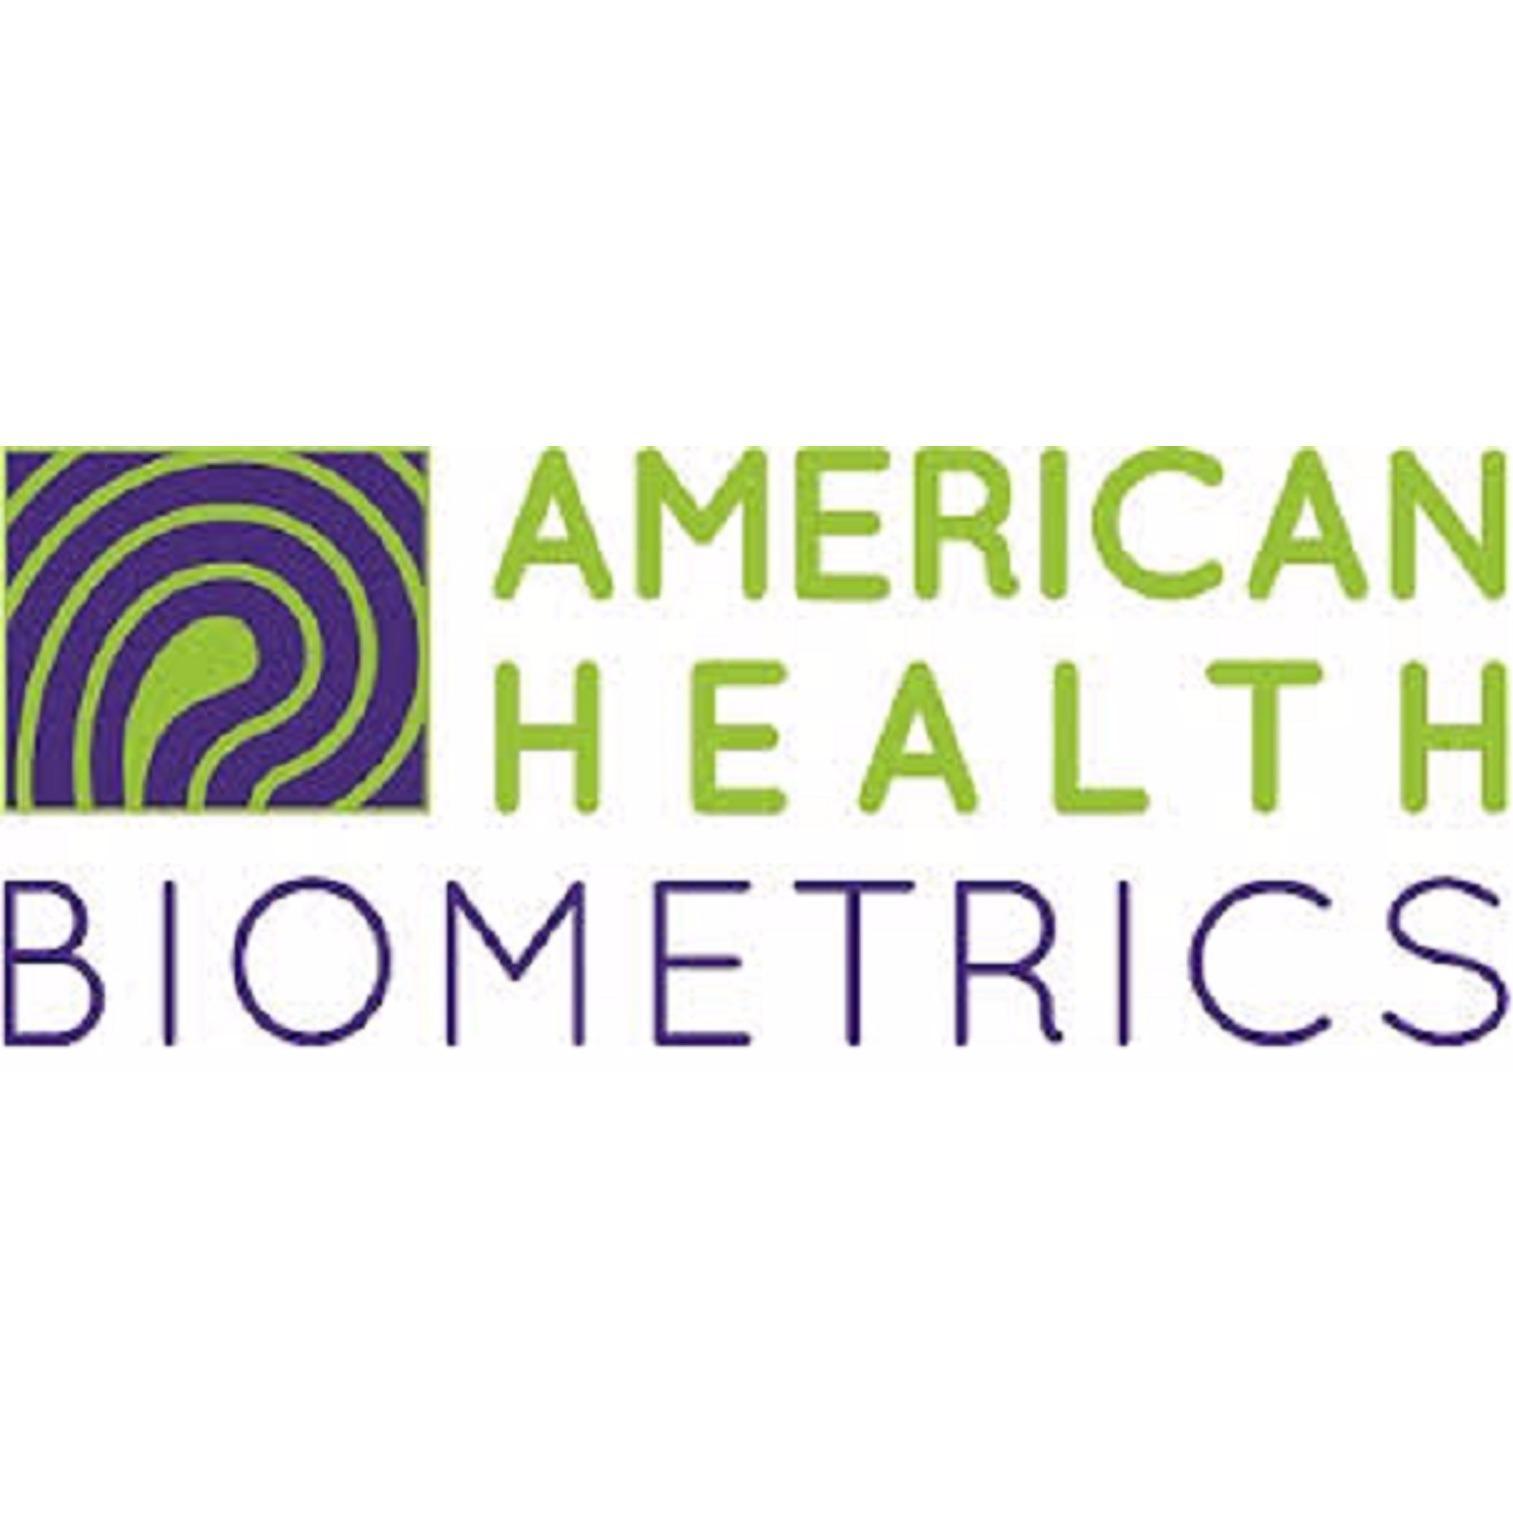 American Health Biometrics